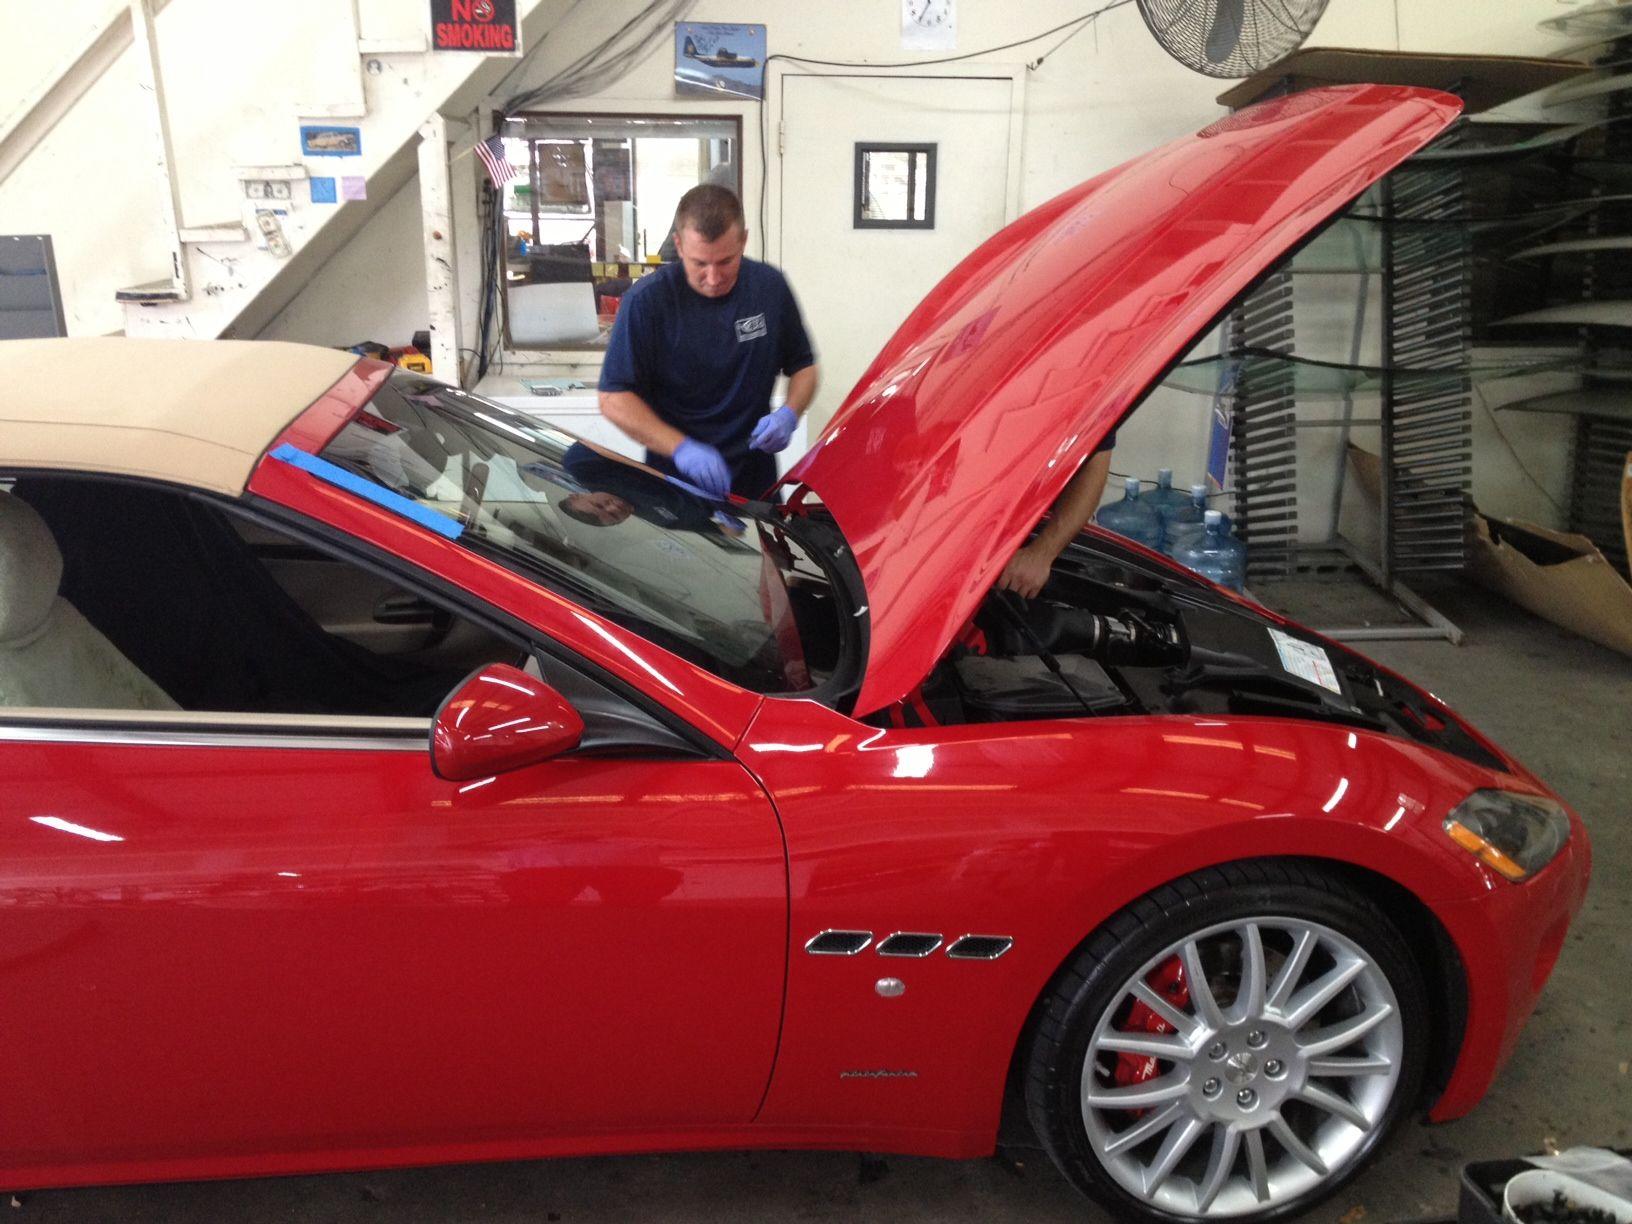 Maserati Nice Car Right Taken At The Pensacola Shop Cool Cars Windshield Car